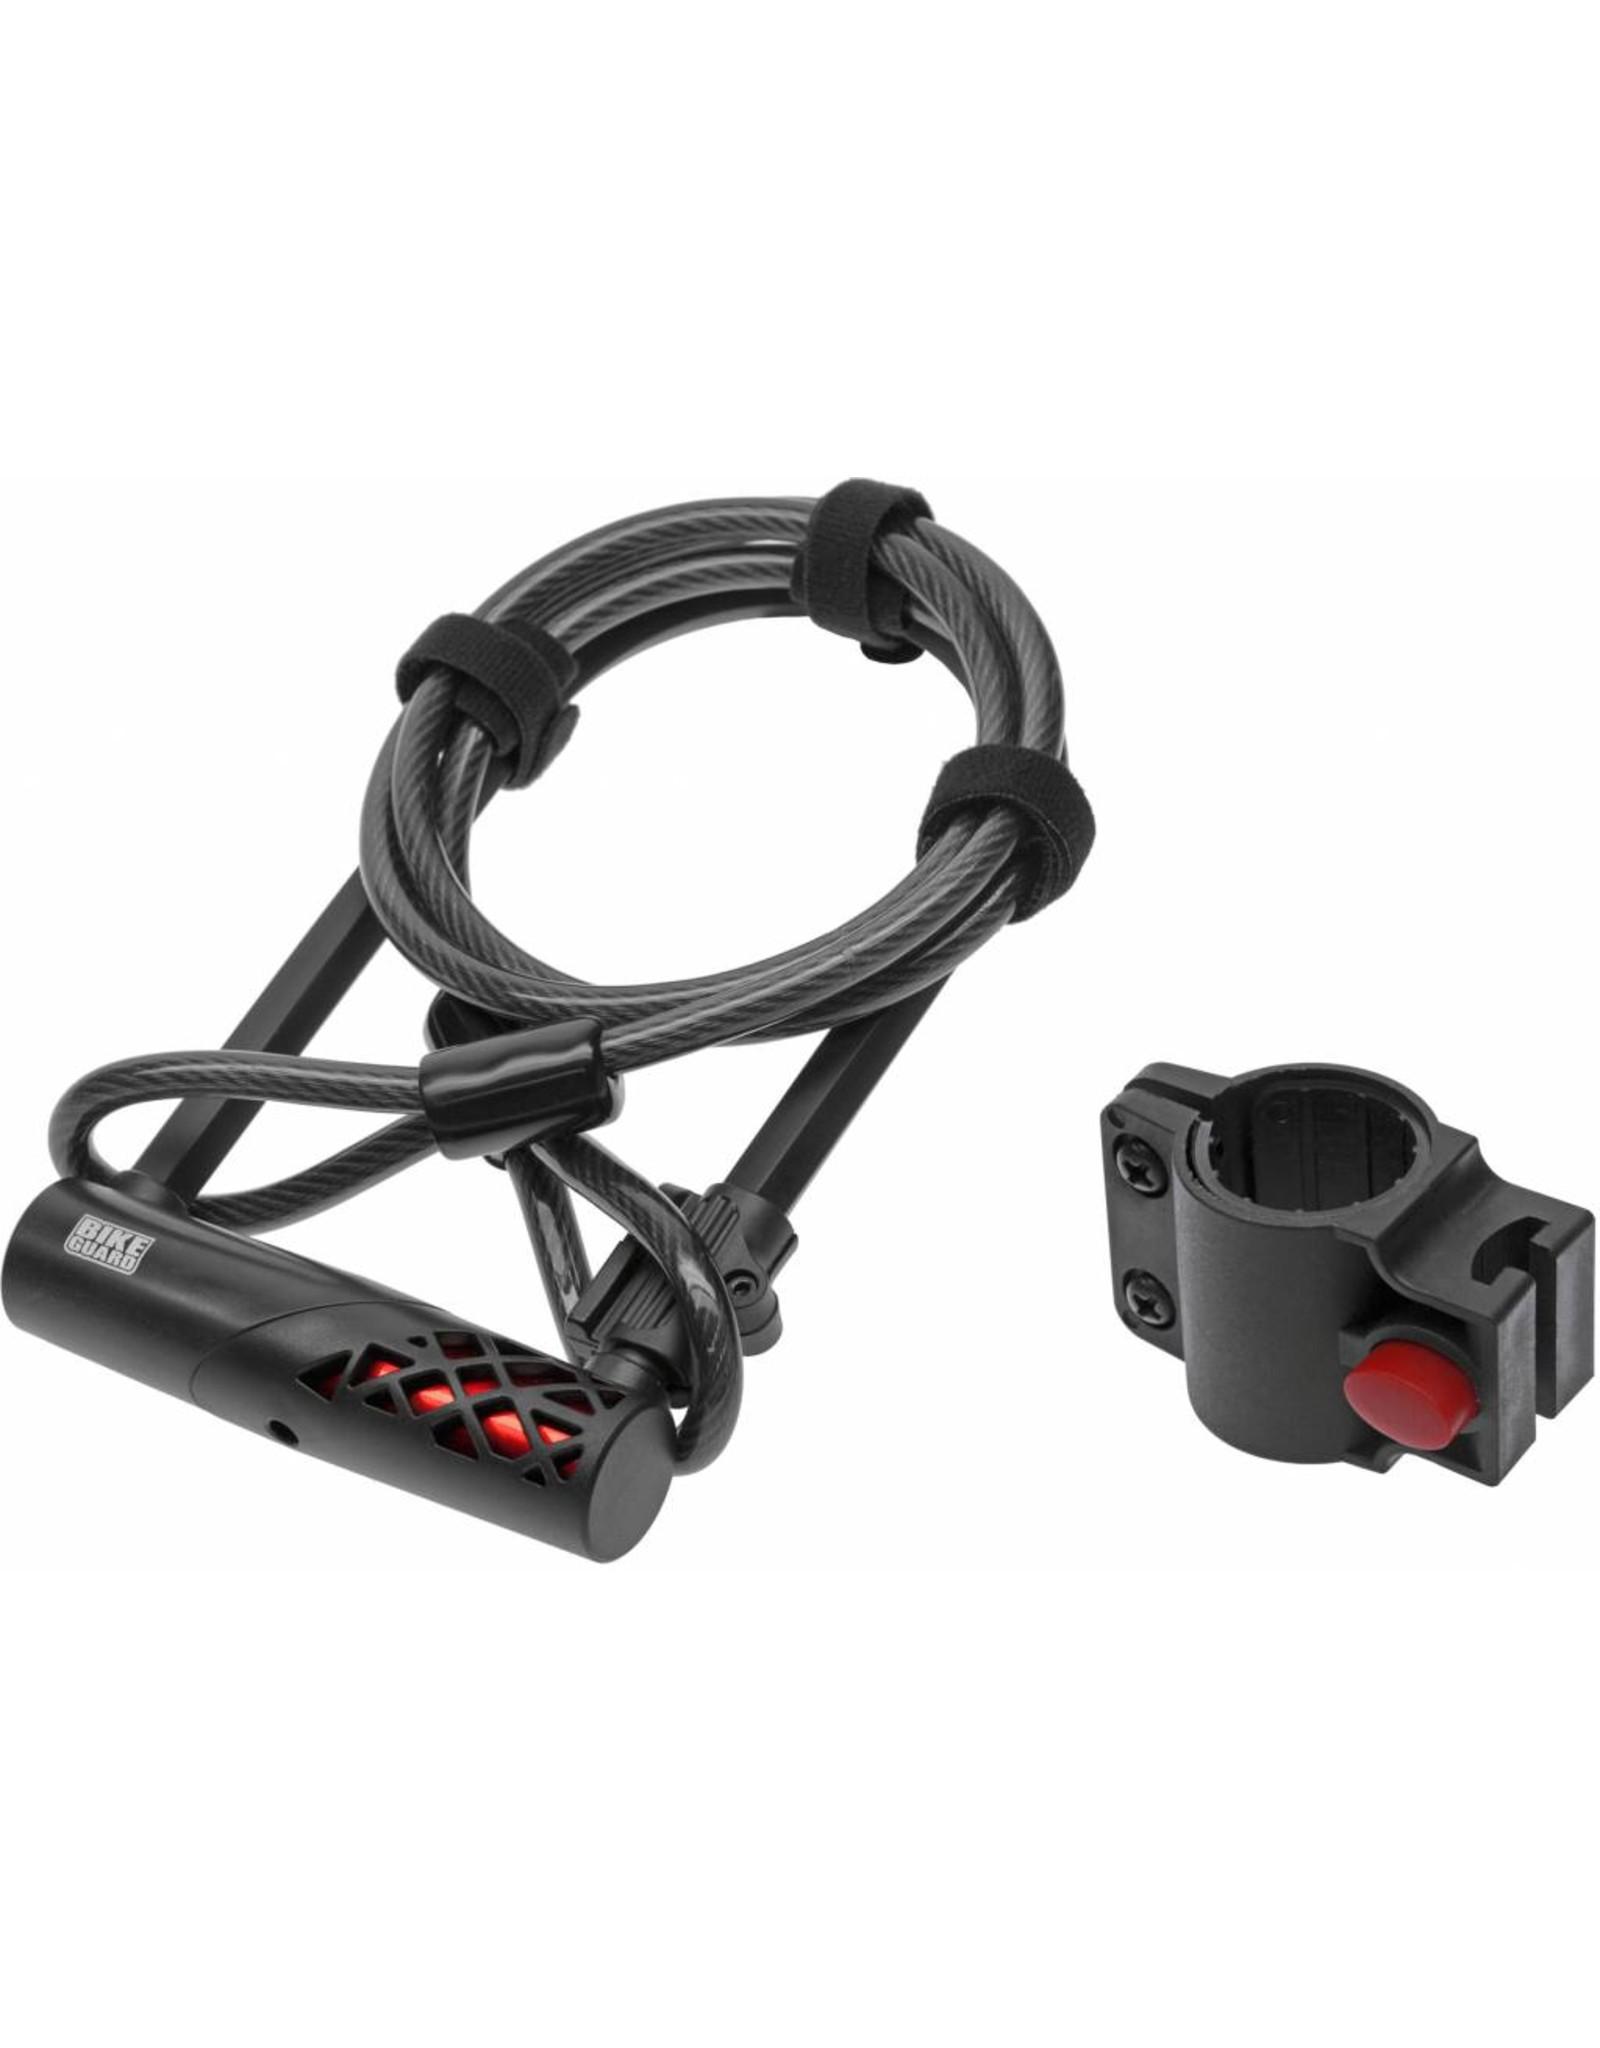 Bikeguard COMBO1320 ULOCK+CABLE